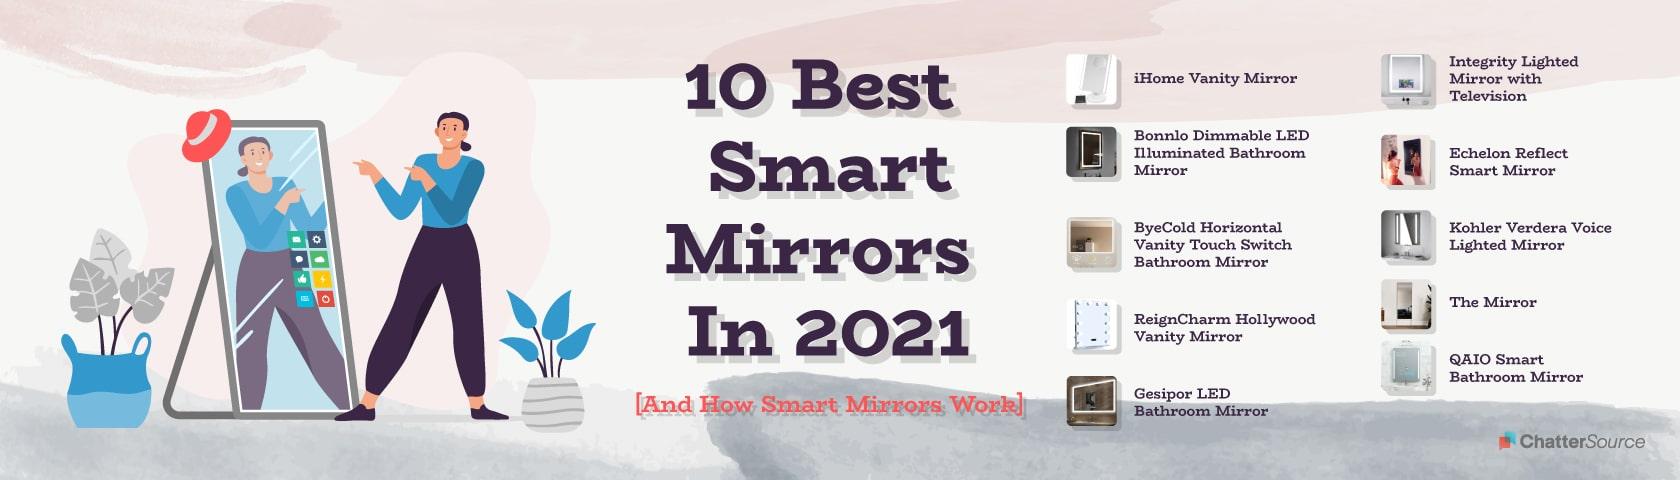 smart mirror infographic